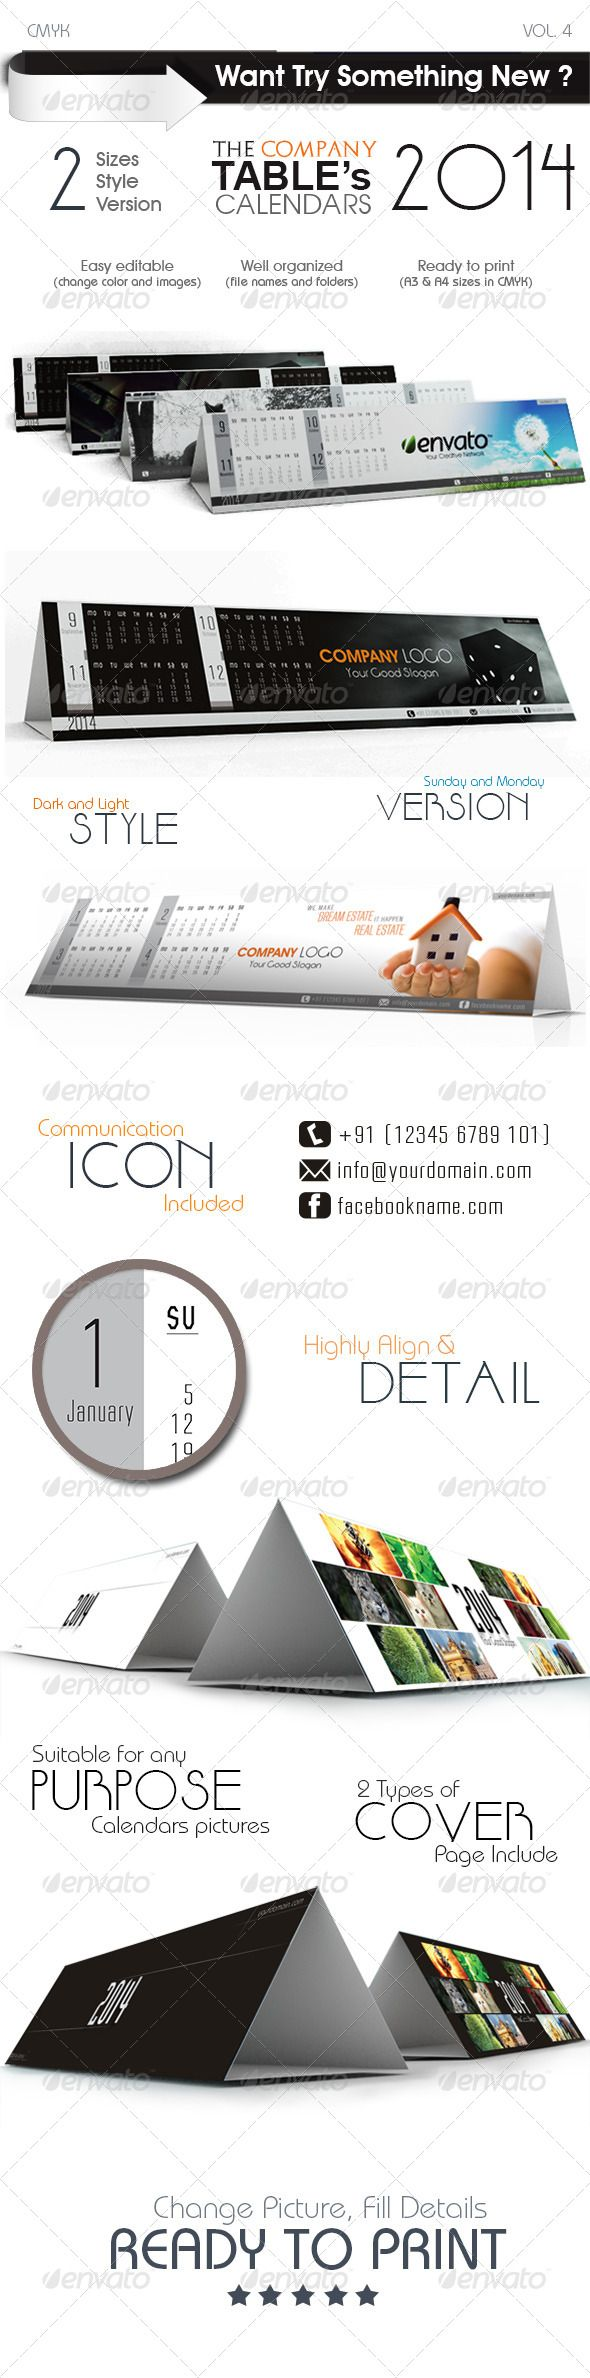 The Company Table Calendars  #GraphicRiver                                                                                                                                                                                 More